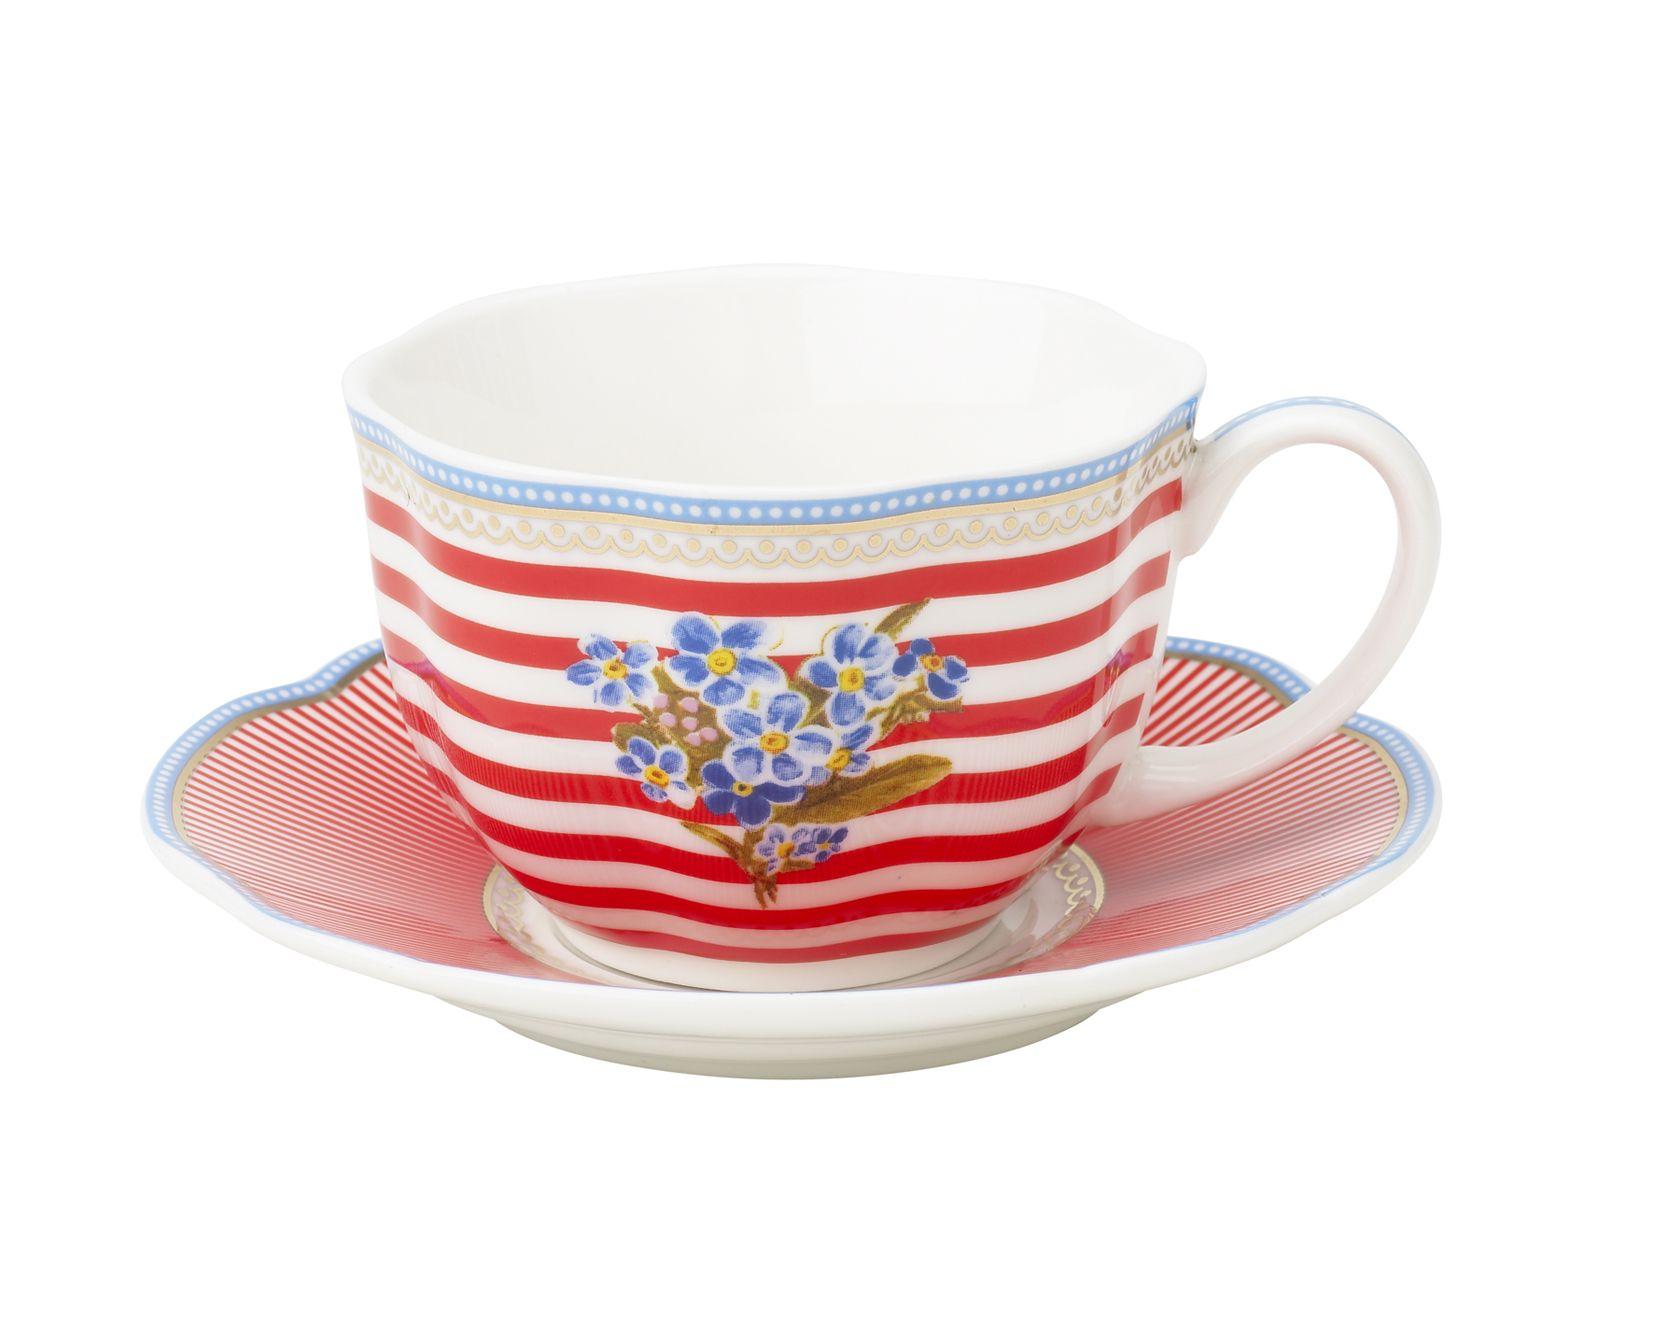 tea cup happy porcelain by lisbeth dahl copenhagen spring summer 2014 lisbethdahlcph. Black Bedroom Furniture Sets. Home Design Ideas